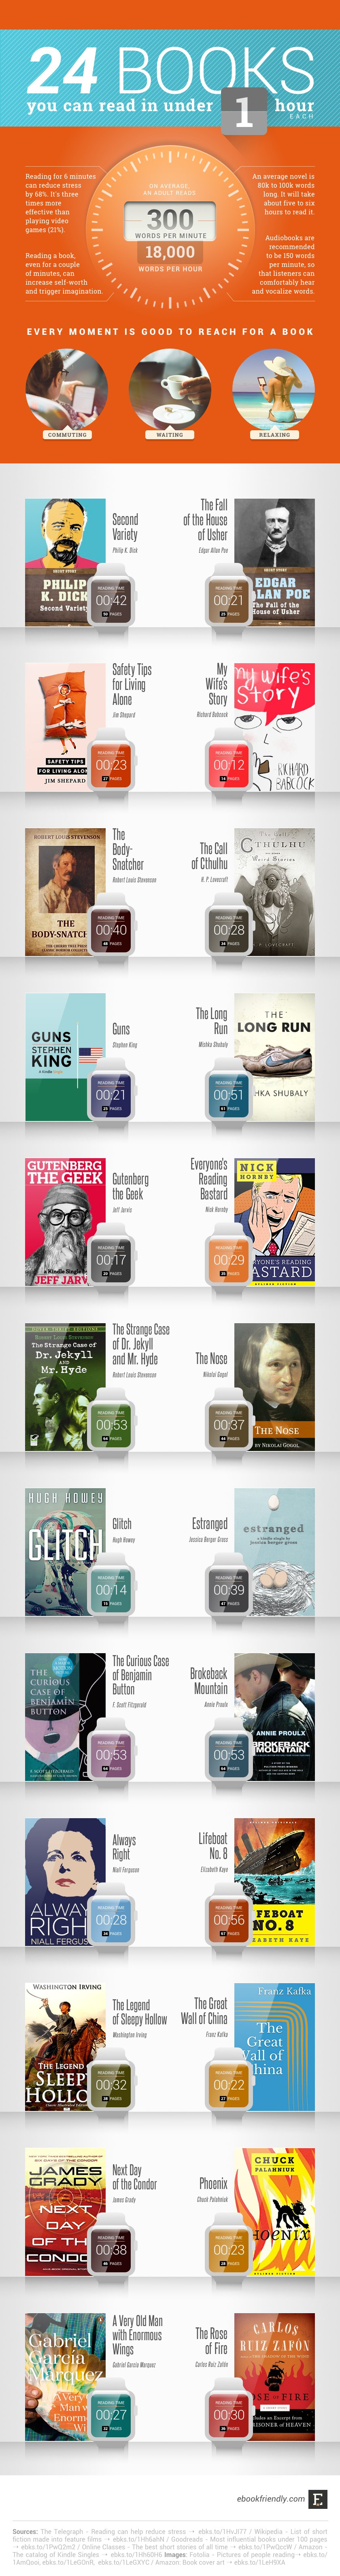 Books-under-hour-full-infographic